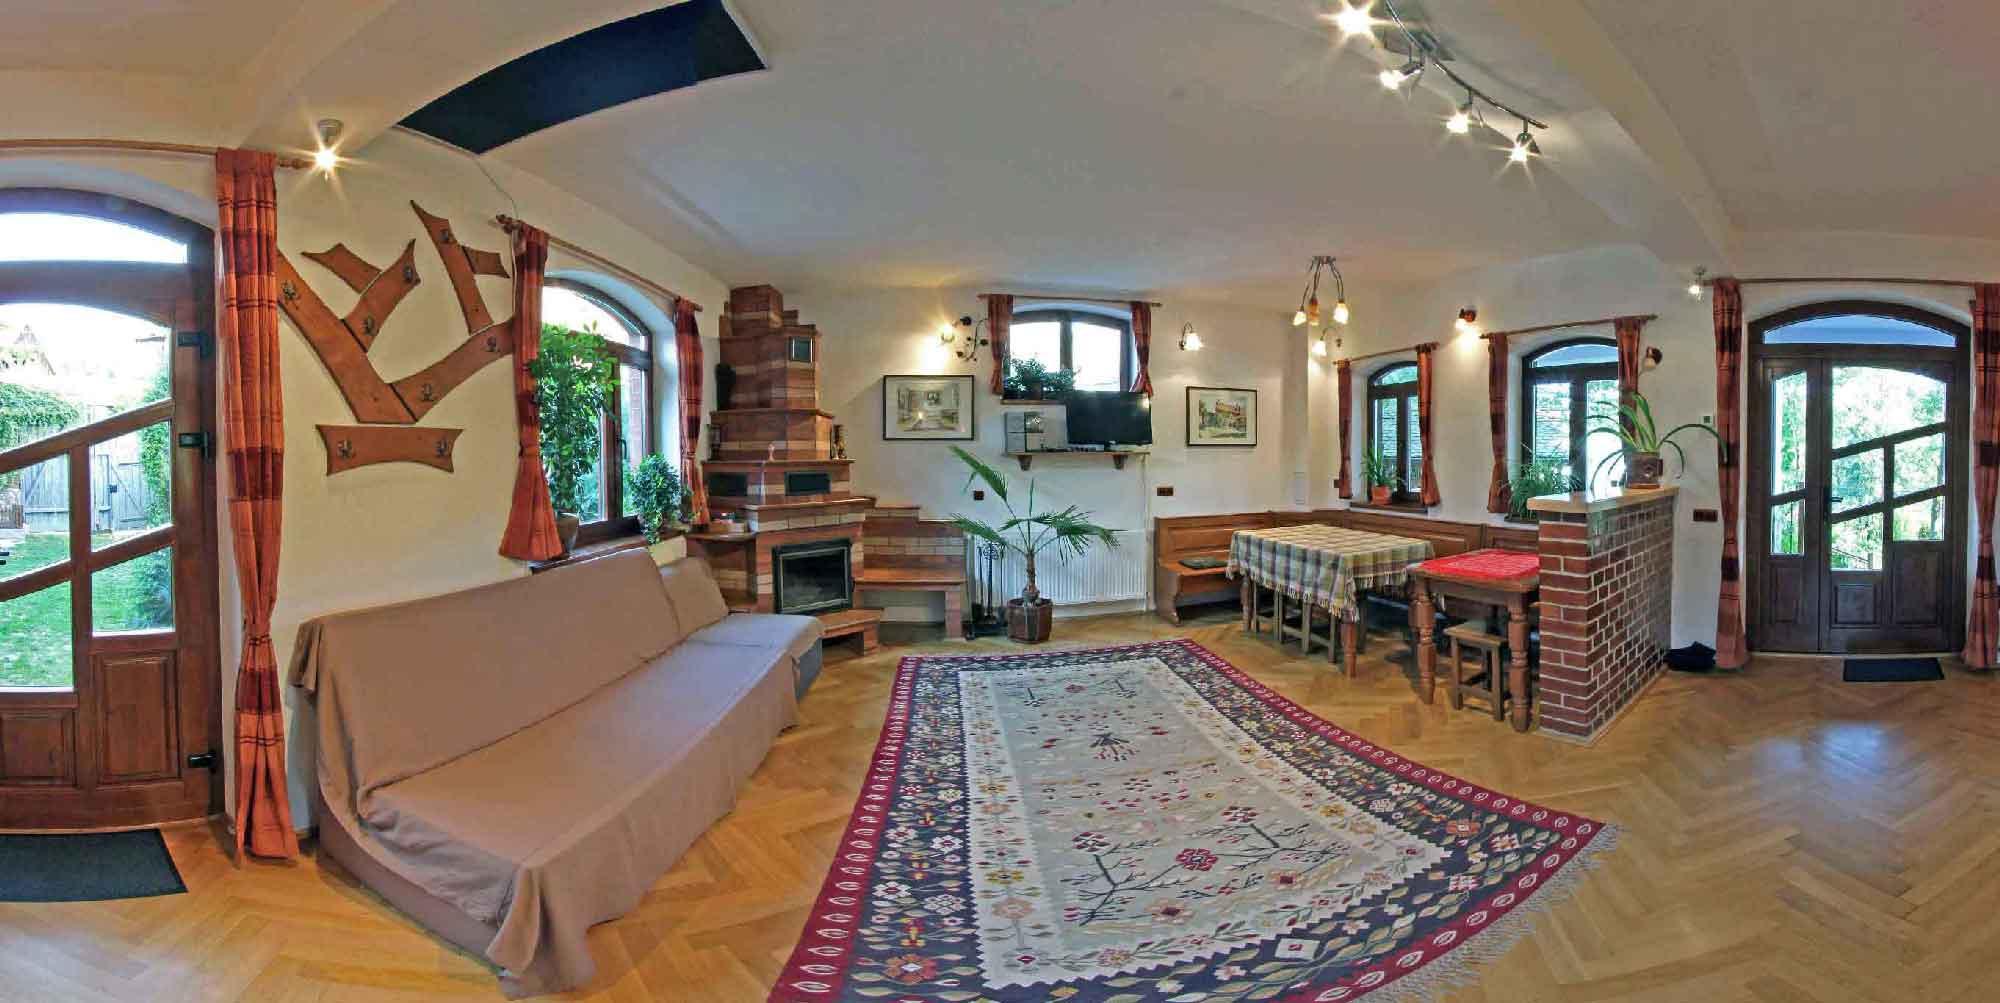 transylvania villa romania sibiu